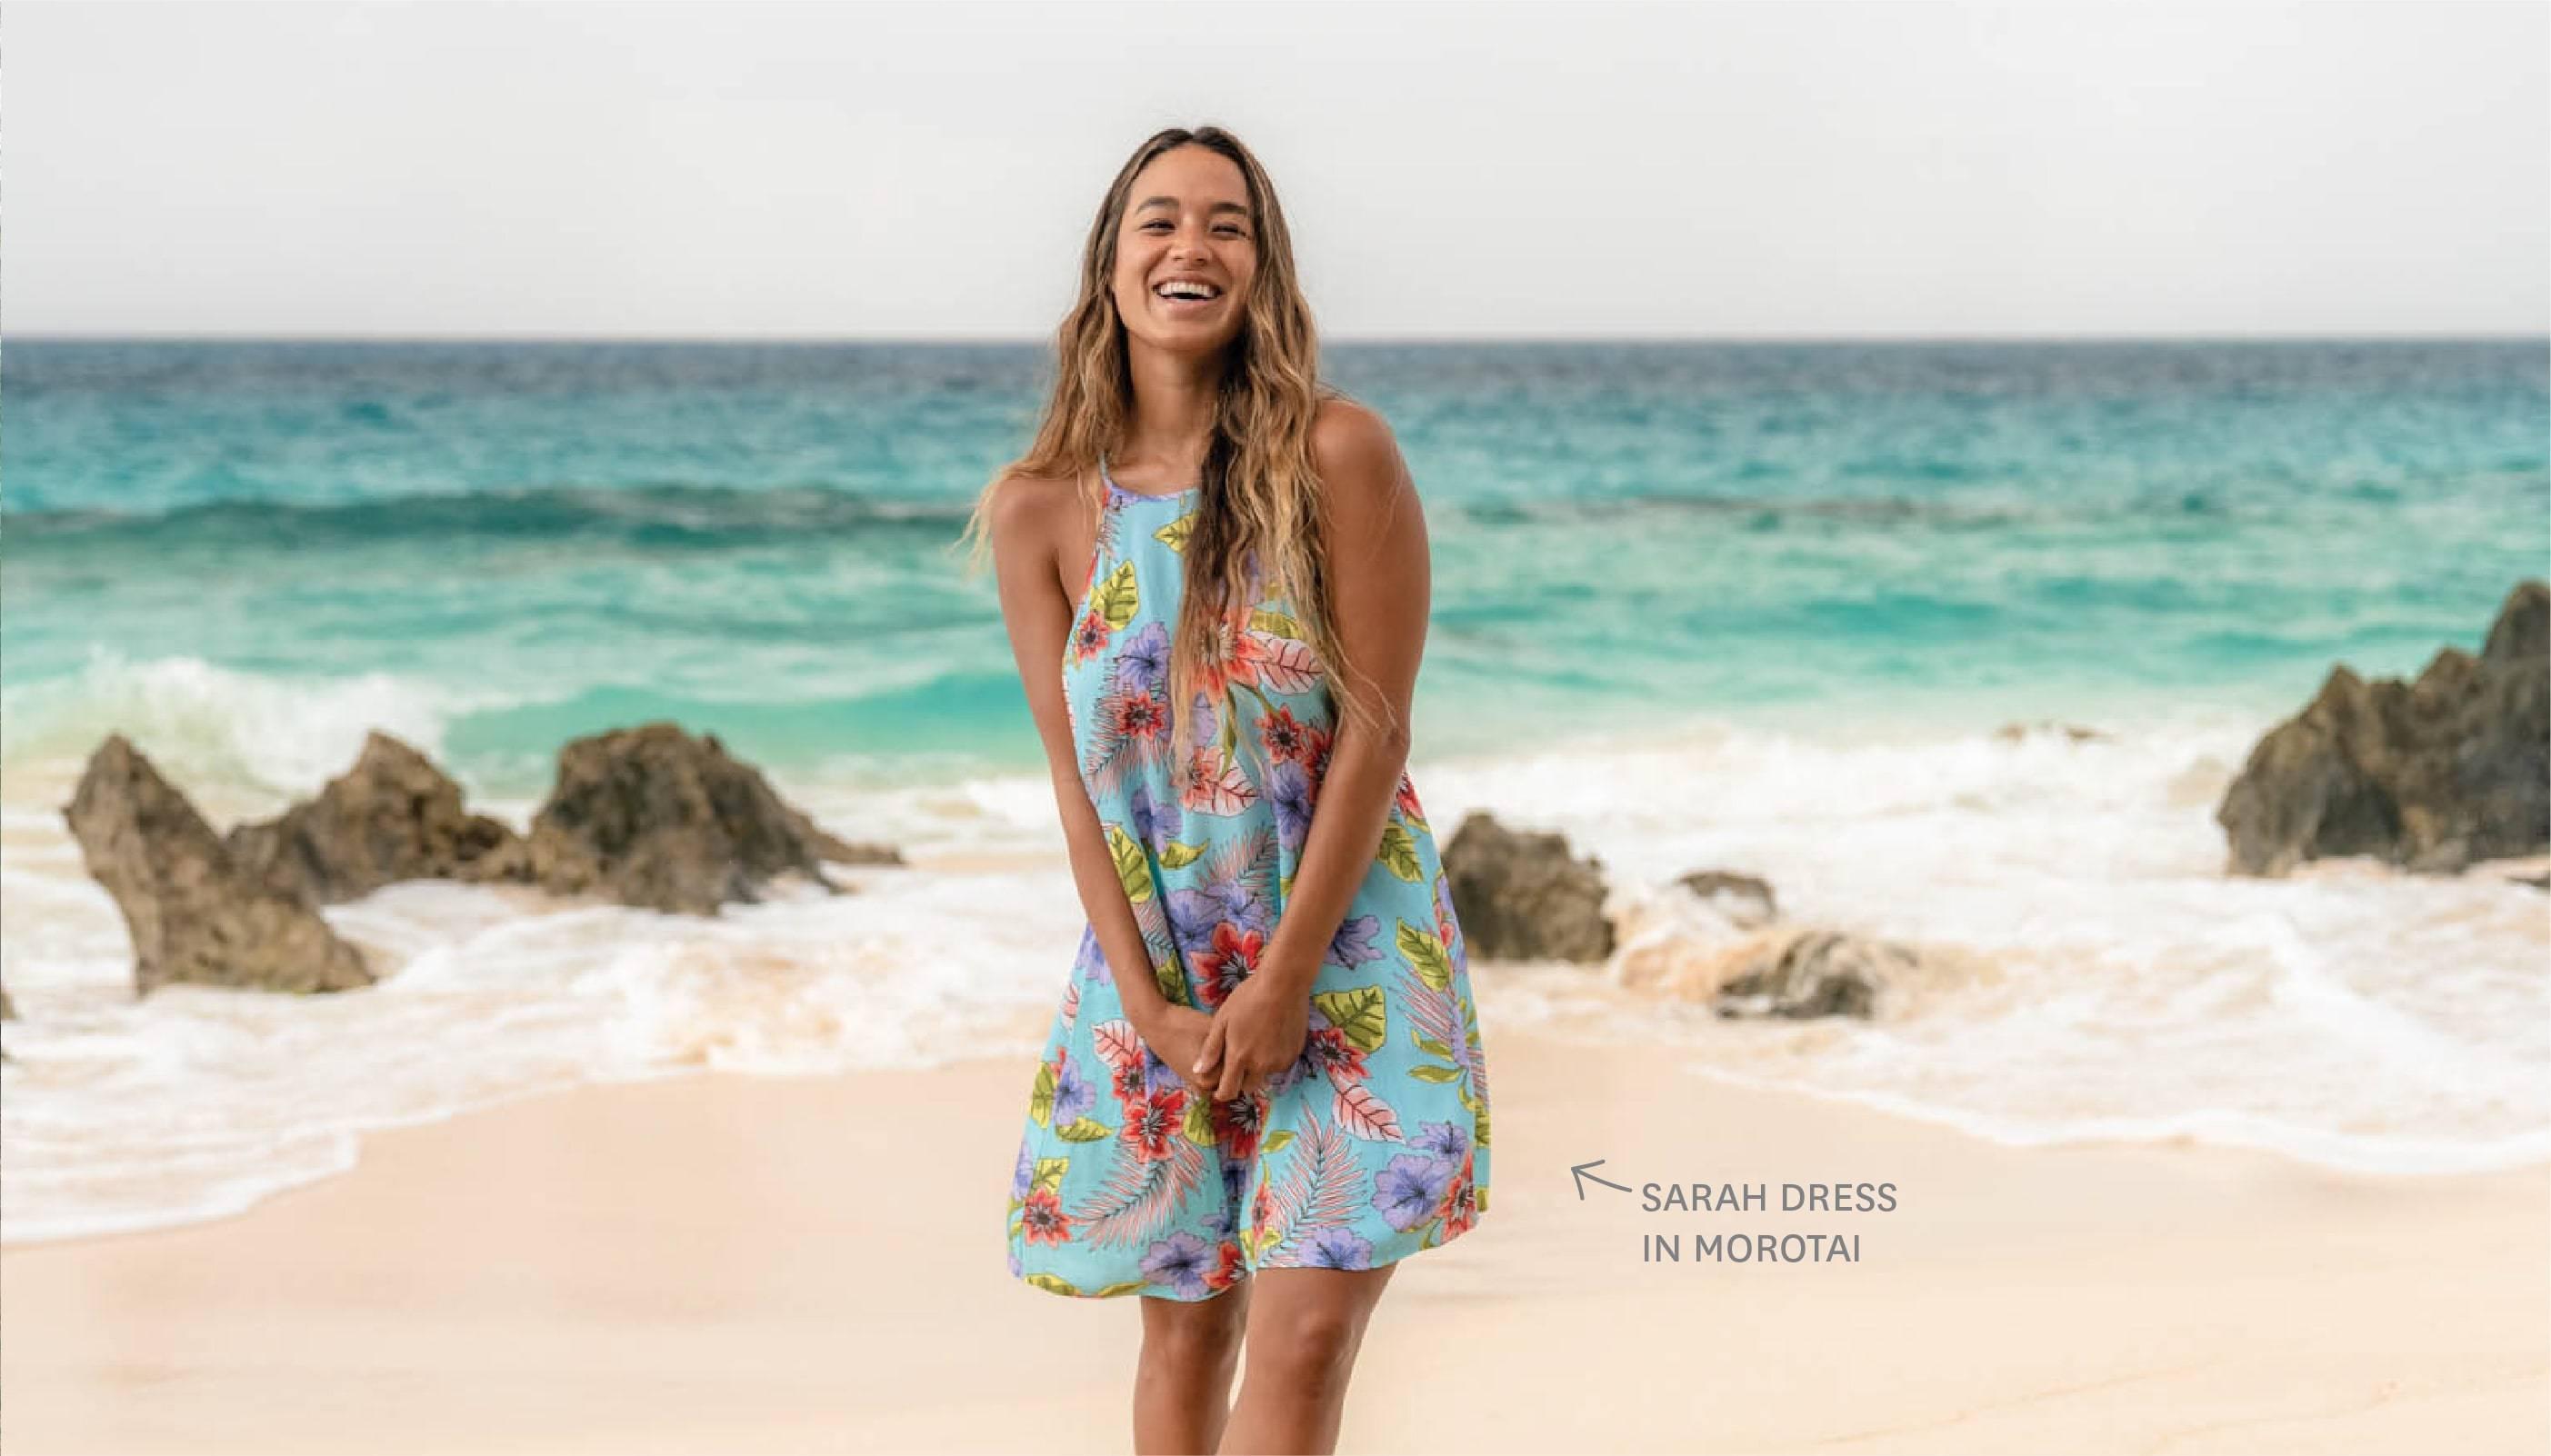 Eidon's Sarah dress in the Morotai print.